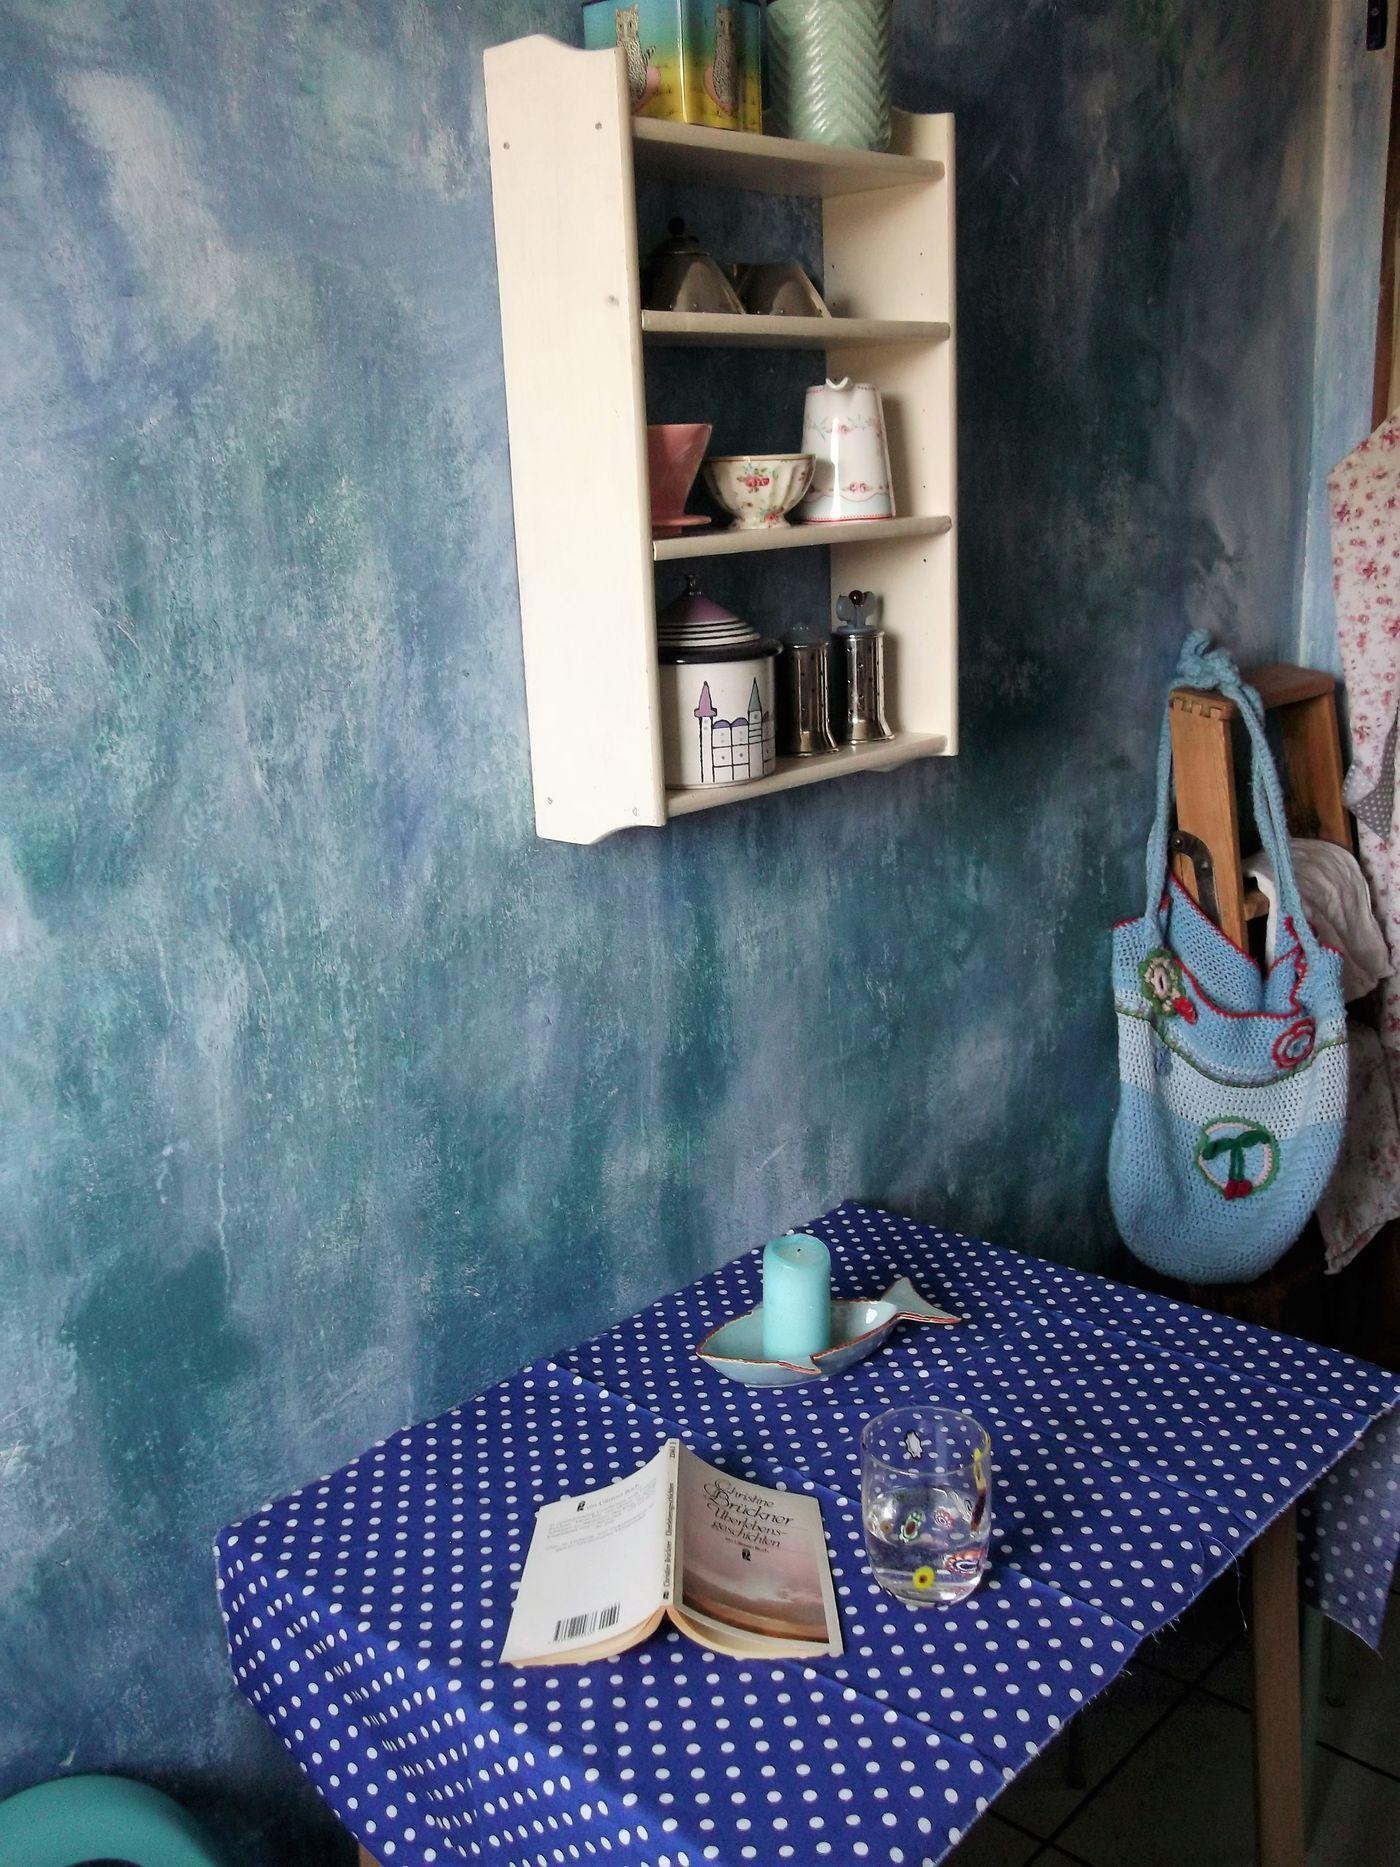 Schön Abwaschbare Farbe Küche Fotos - Heimat Ideen ...